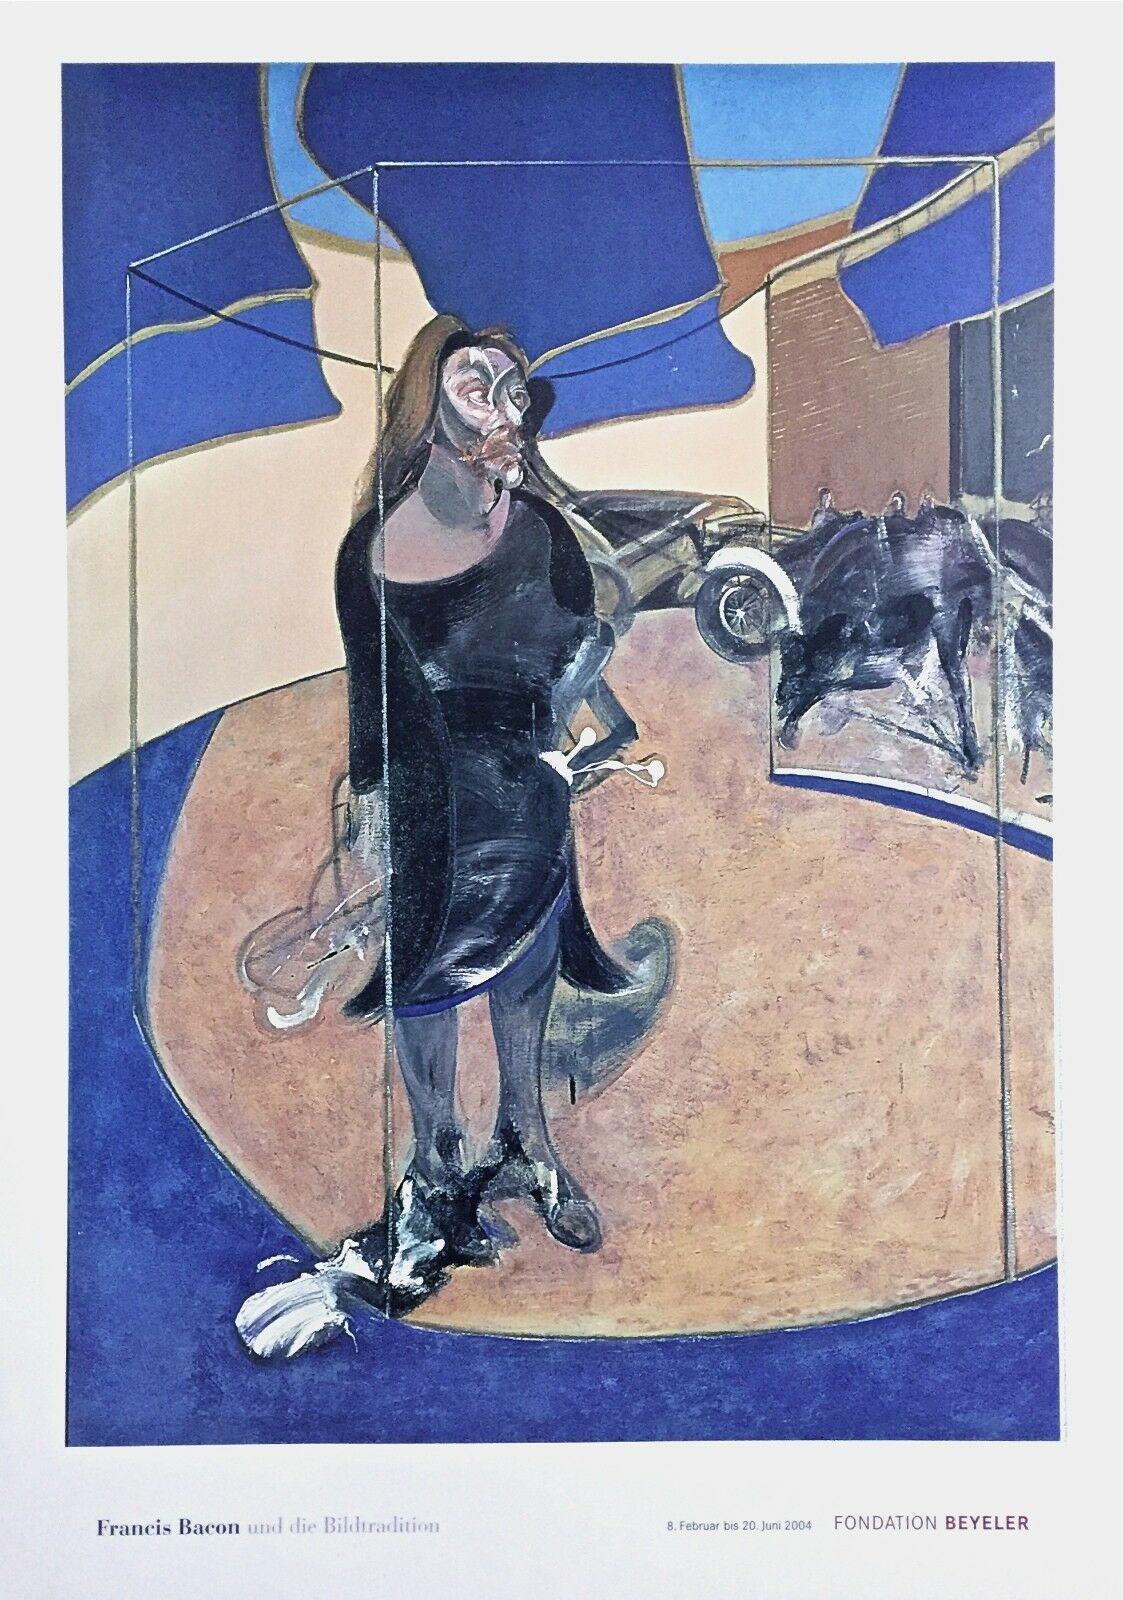 Portrait Isabel Rawsthorne, 2003 Foundation Beyeler Exhibition Offset Lithograph